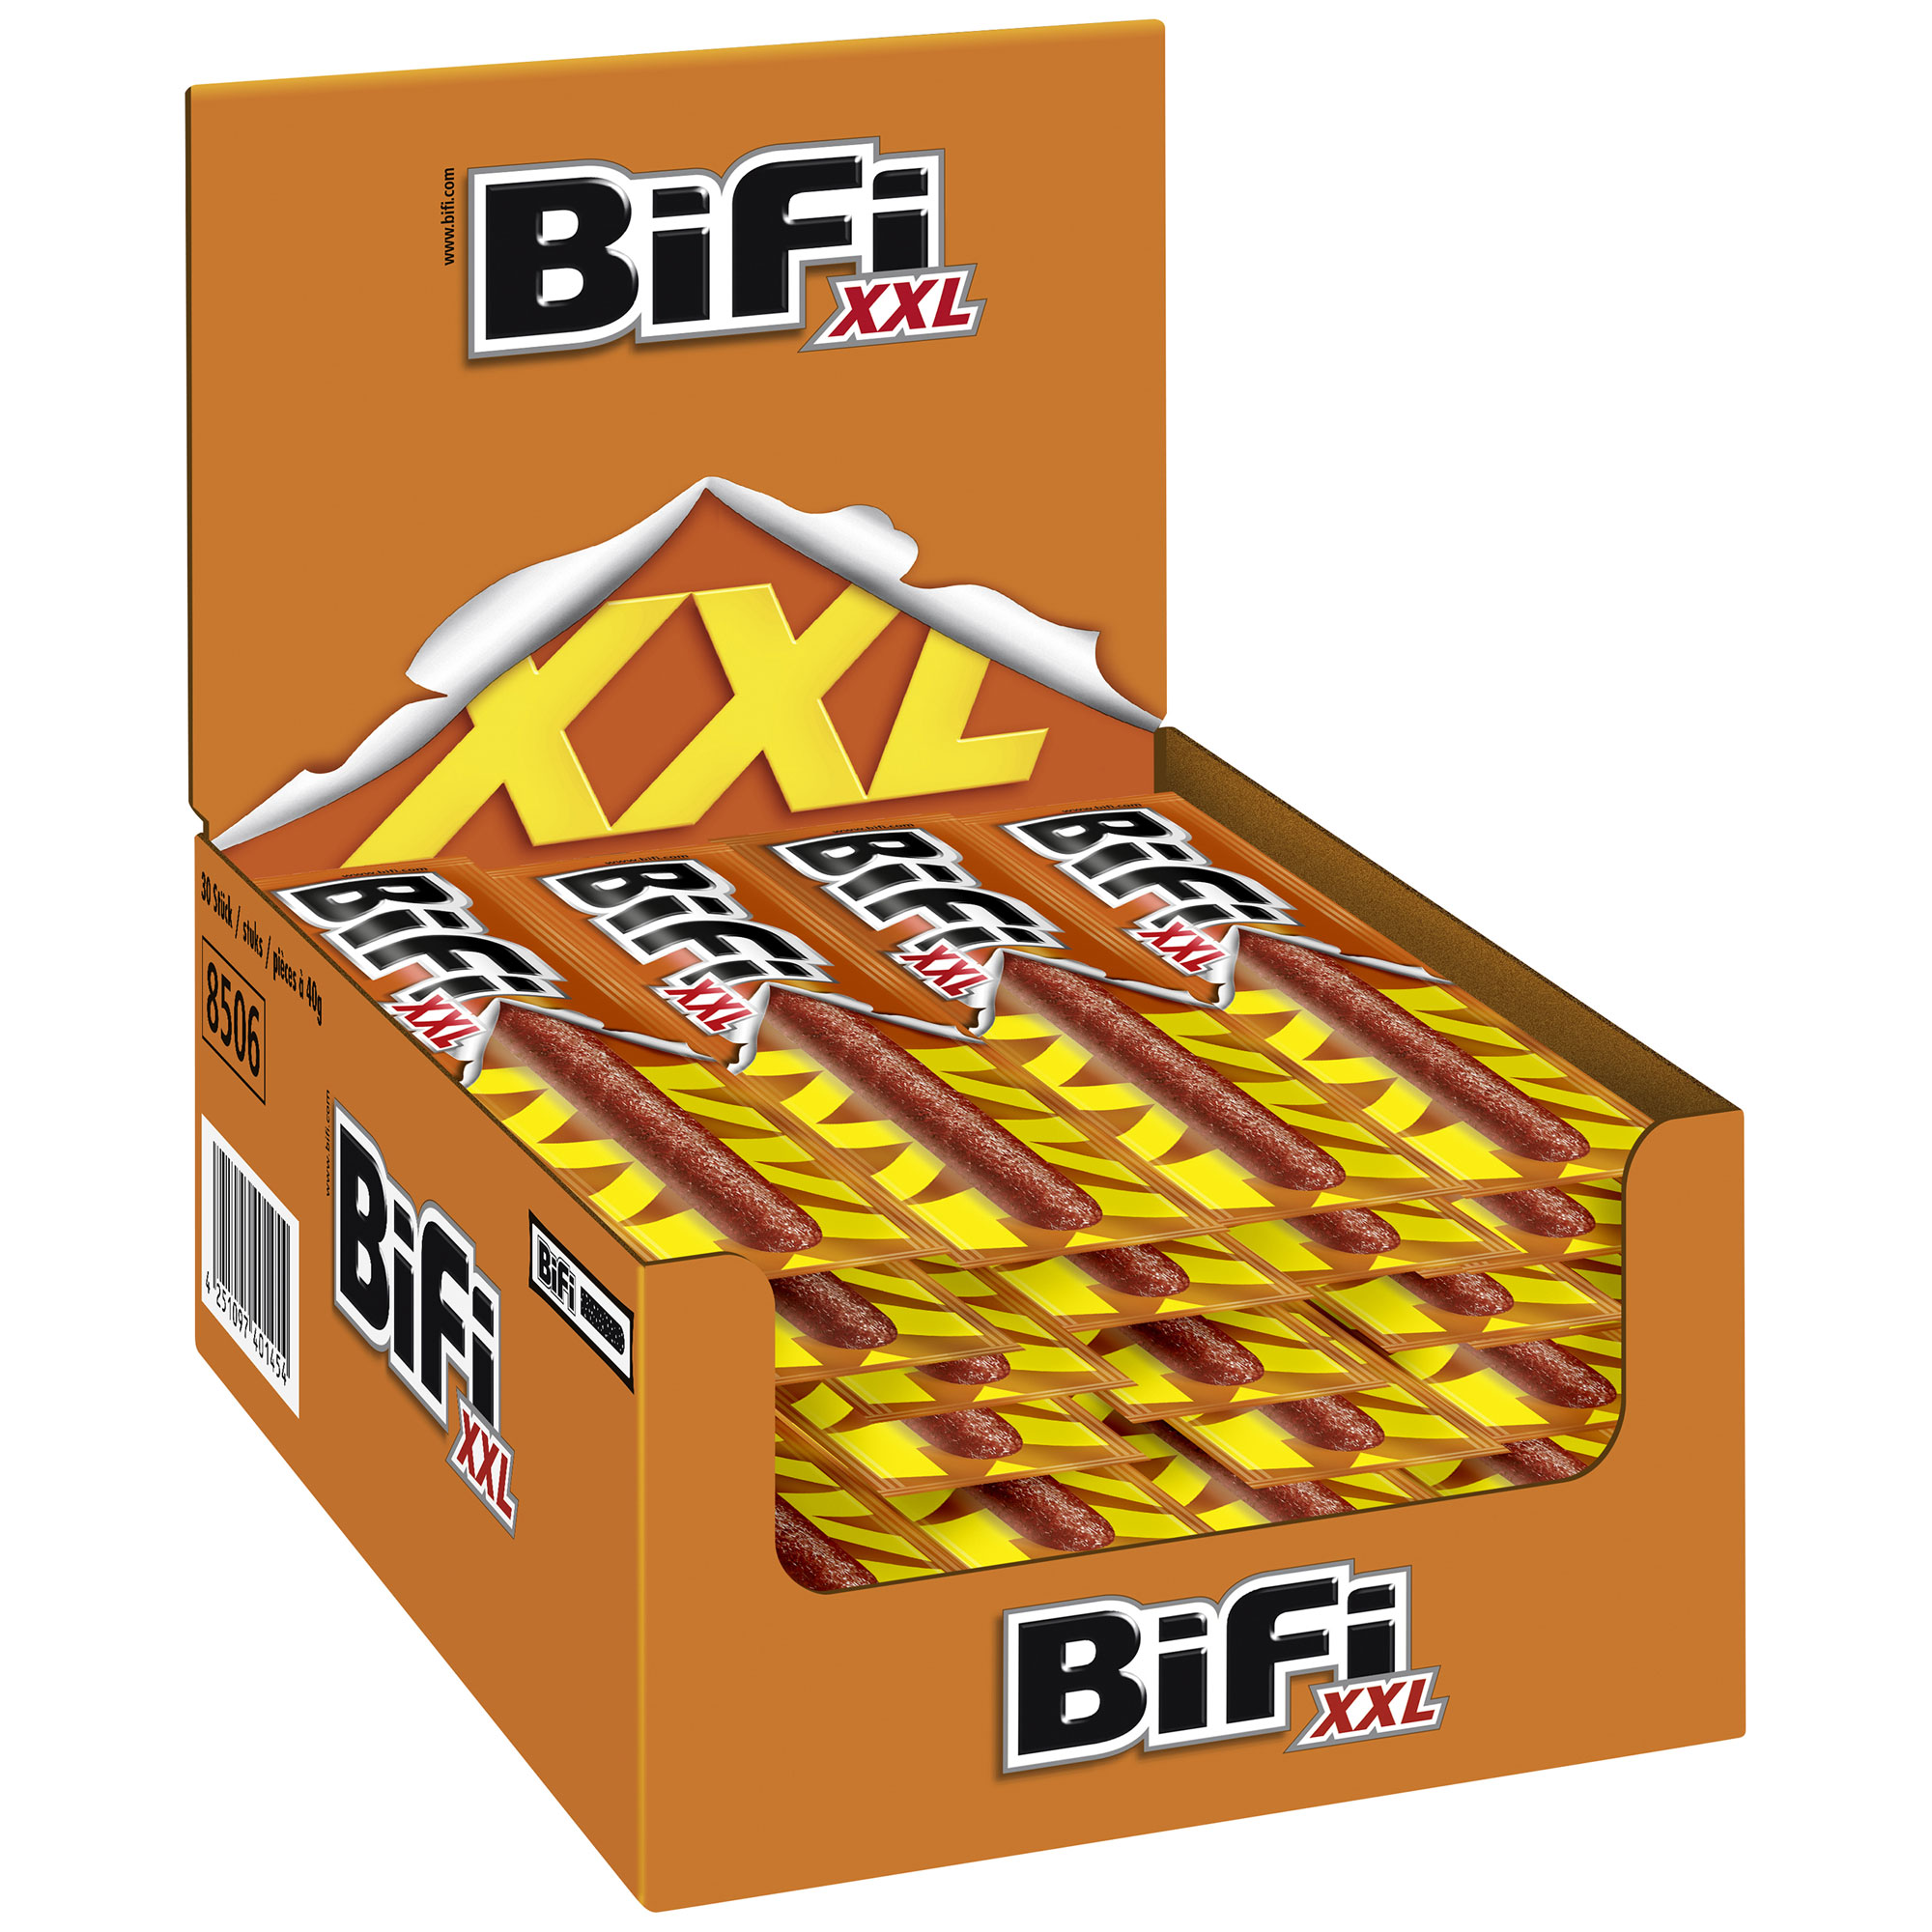 bifi original xxl online kaufen im world of sweets shop. Black Bedroom Furniture Sets. Home Design Ideas